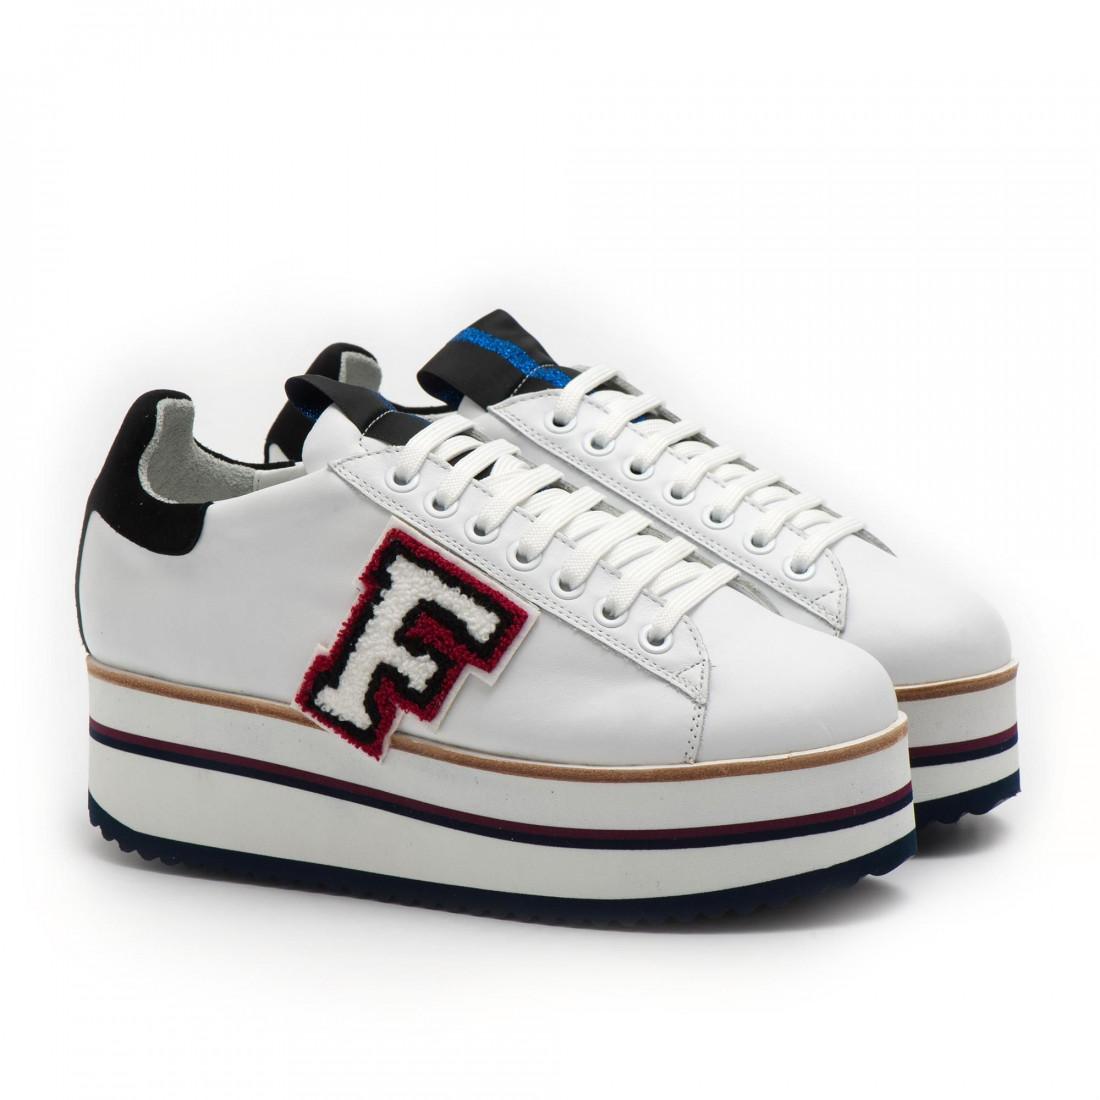 sneakers donna fabi fd5840c00spanapb08 3520